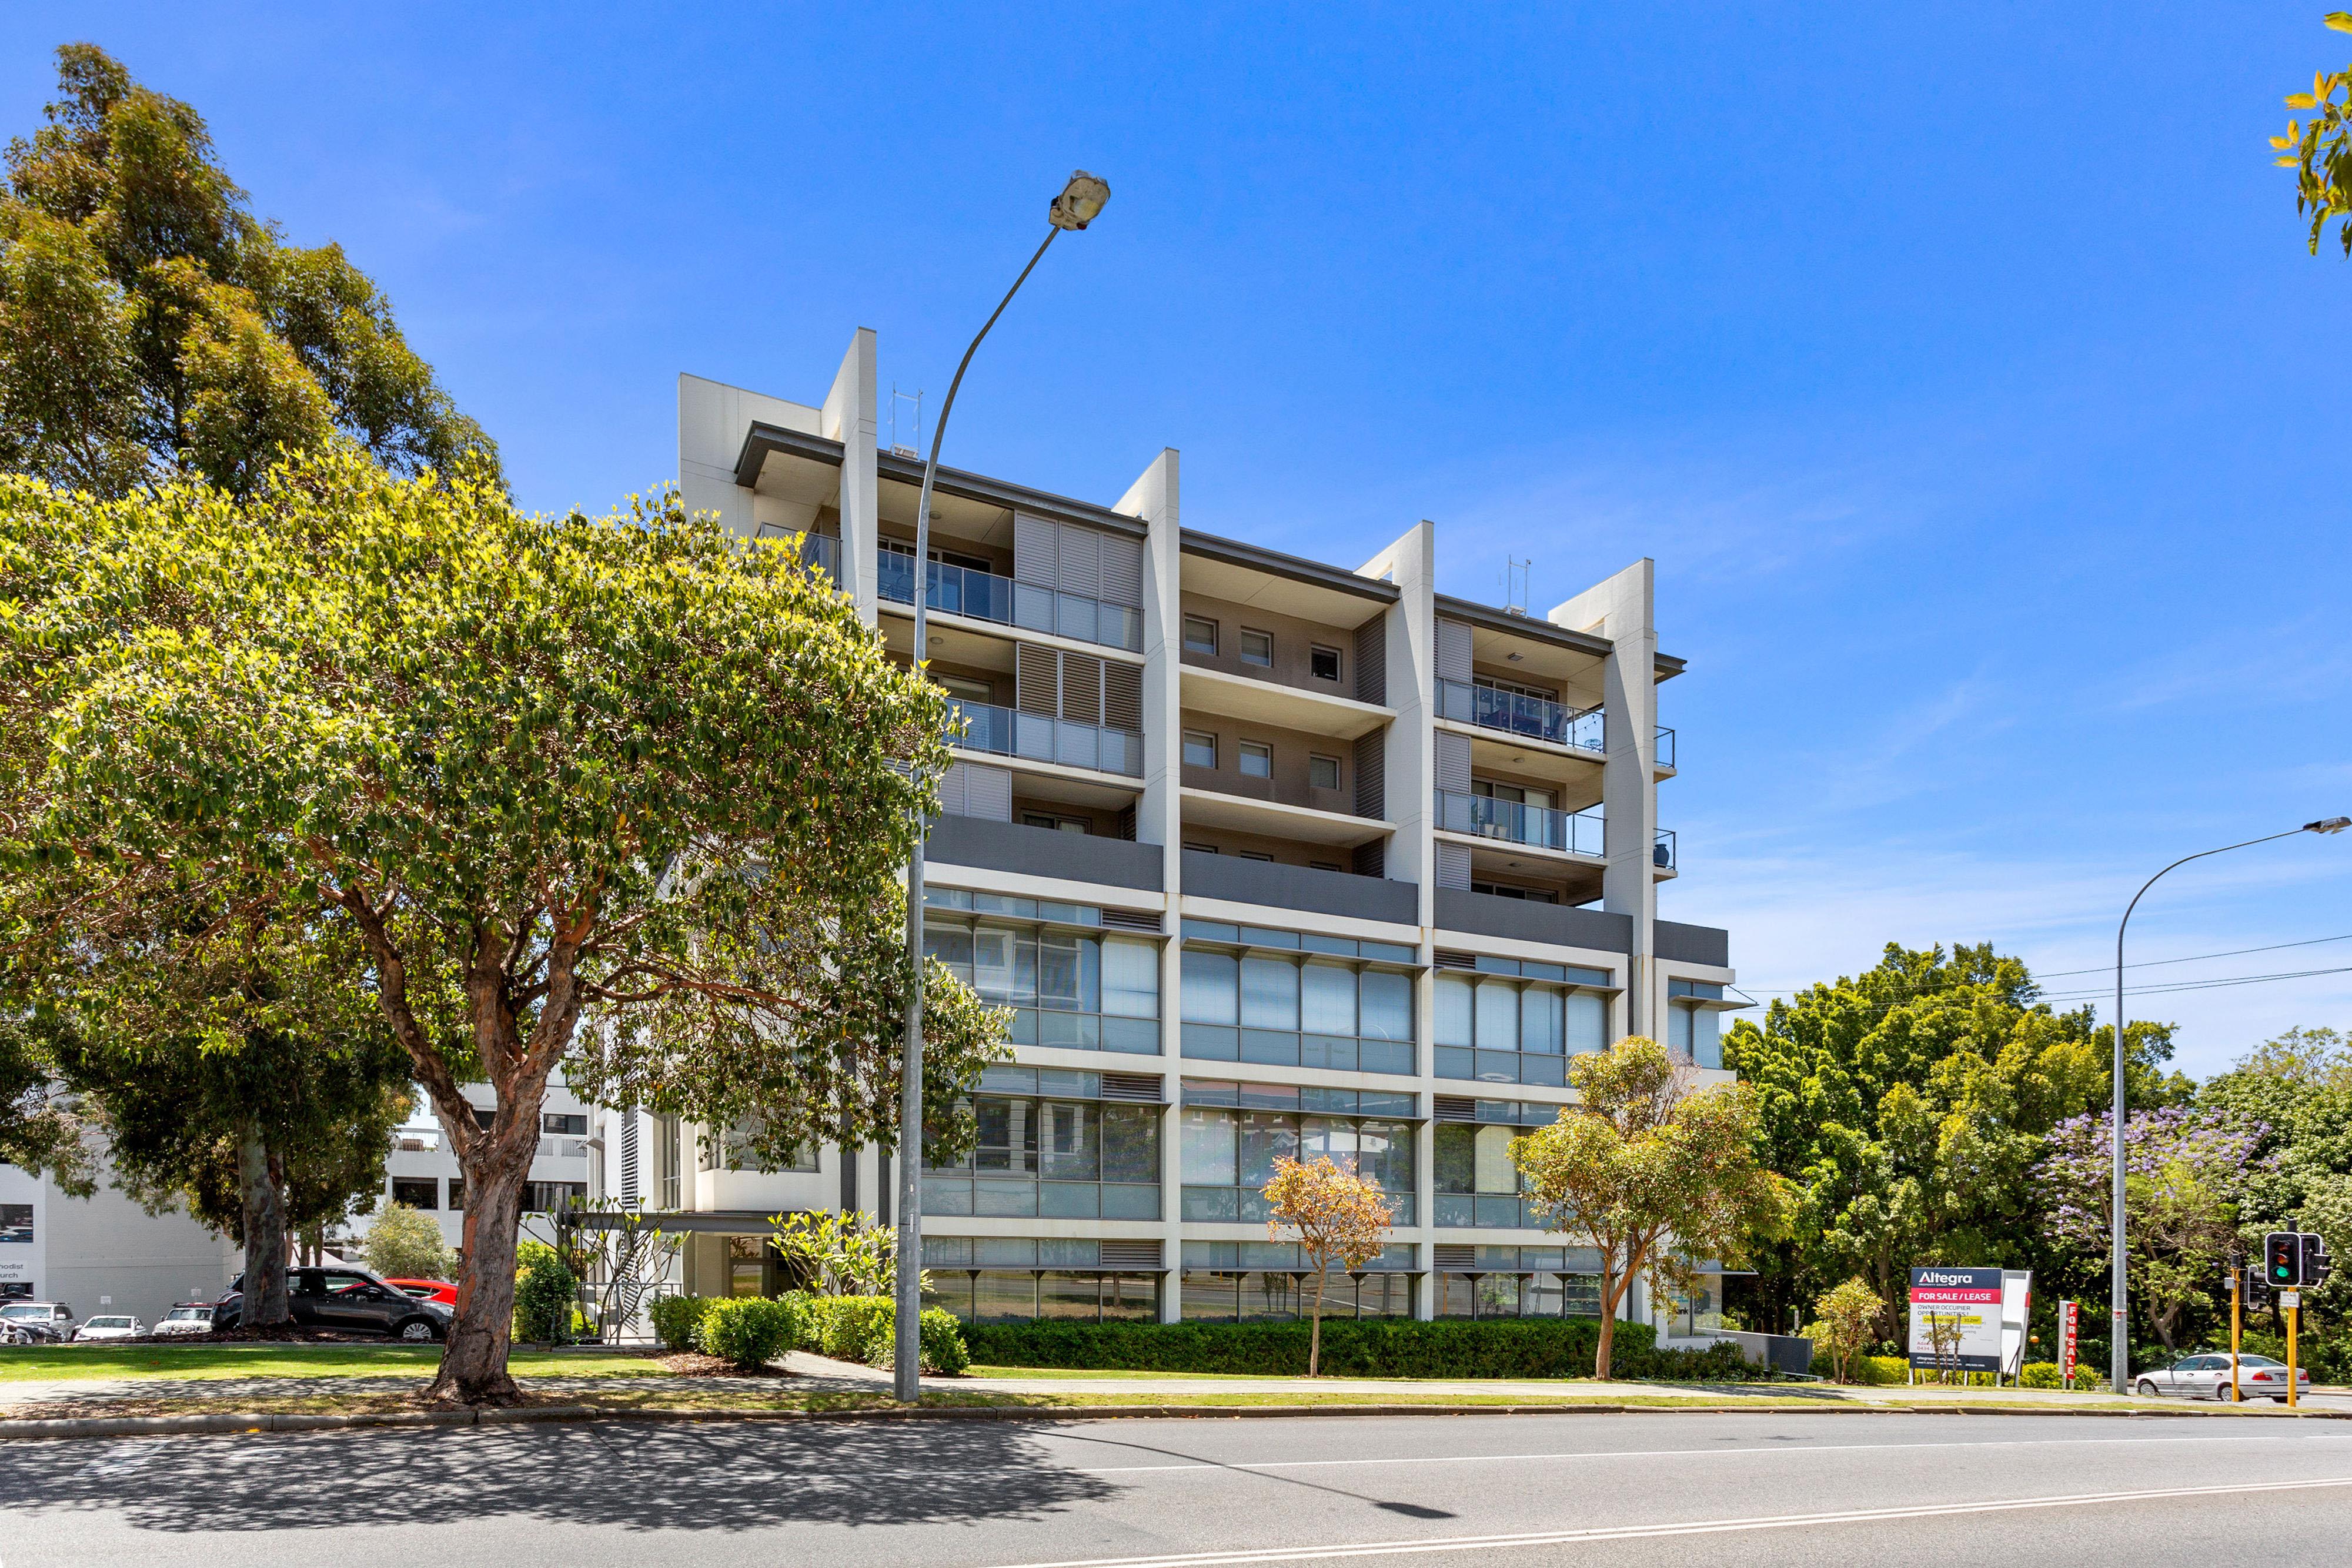 PRINT 9 111 Colin Street, West Perth 23.